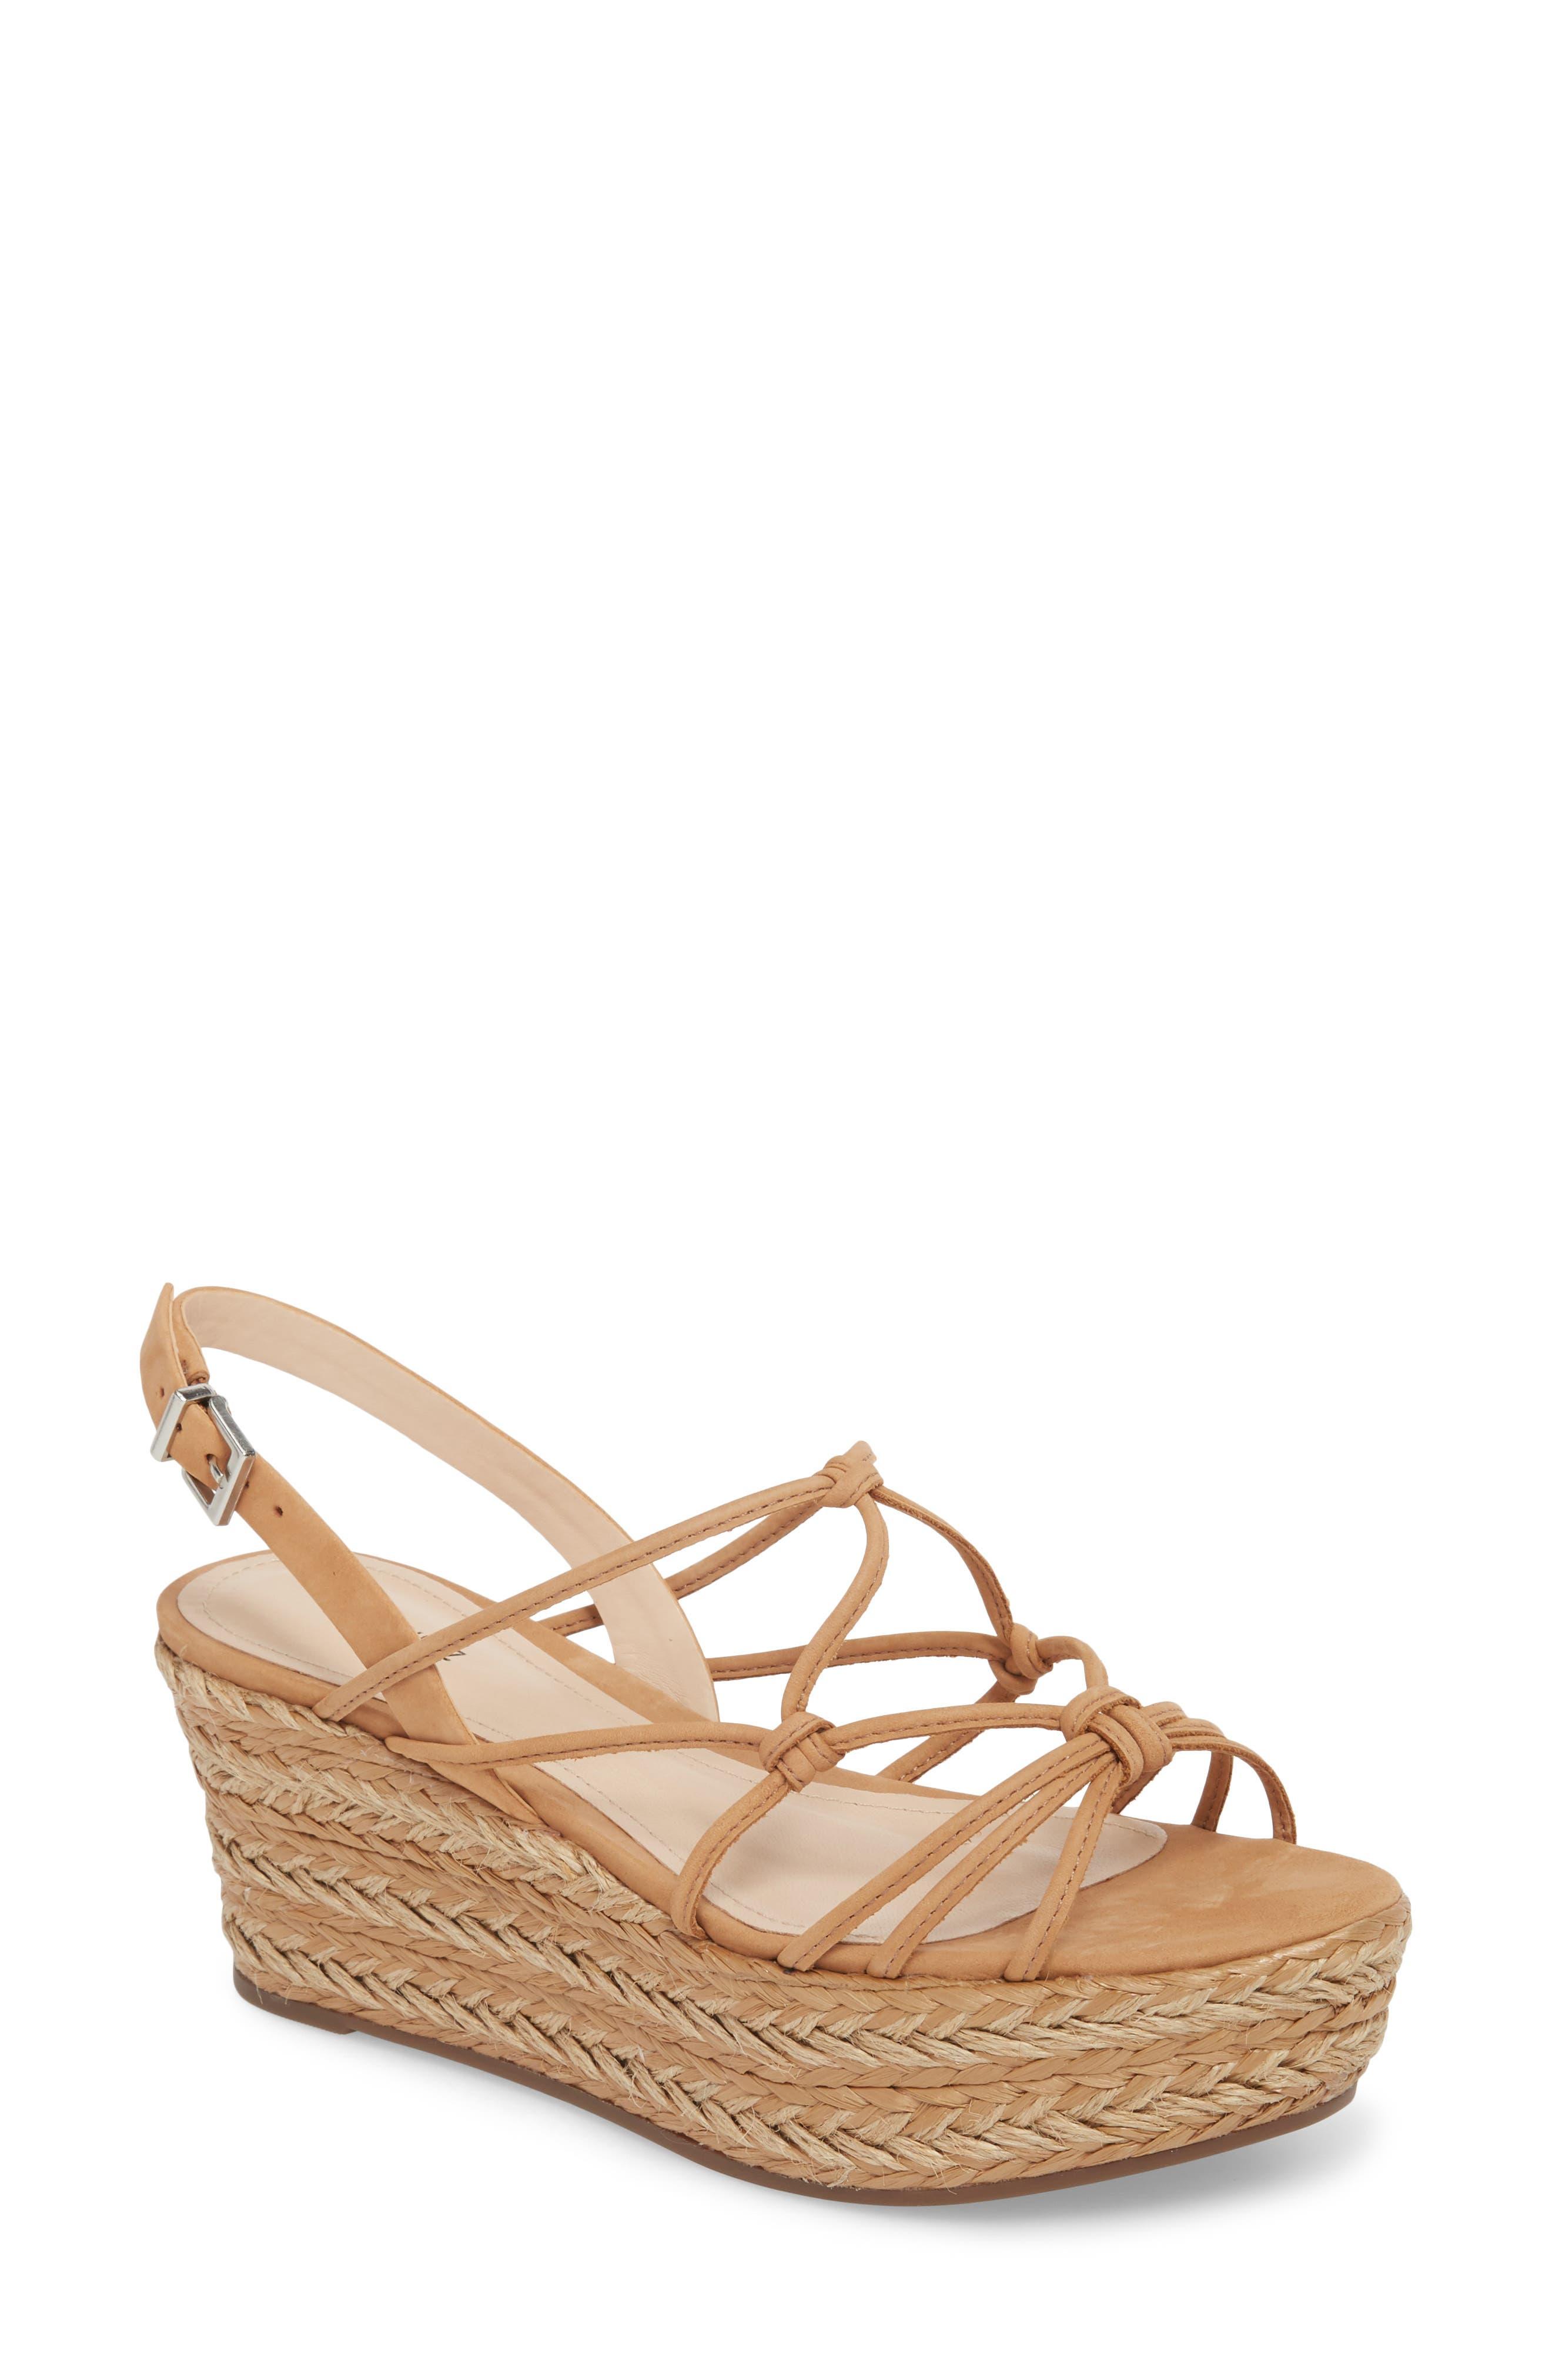 Latussa Platform Espadrille Sandal,                             Main thumbnail 1, color,                             Desert Leather